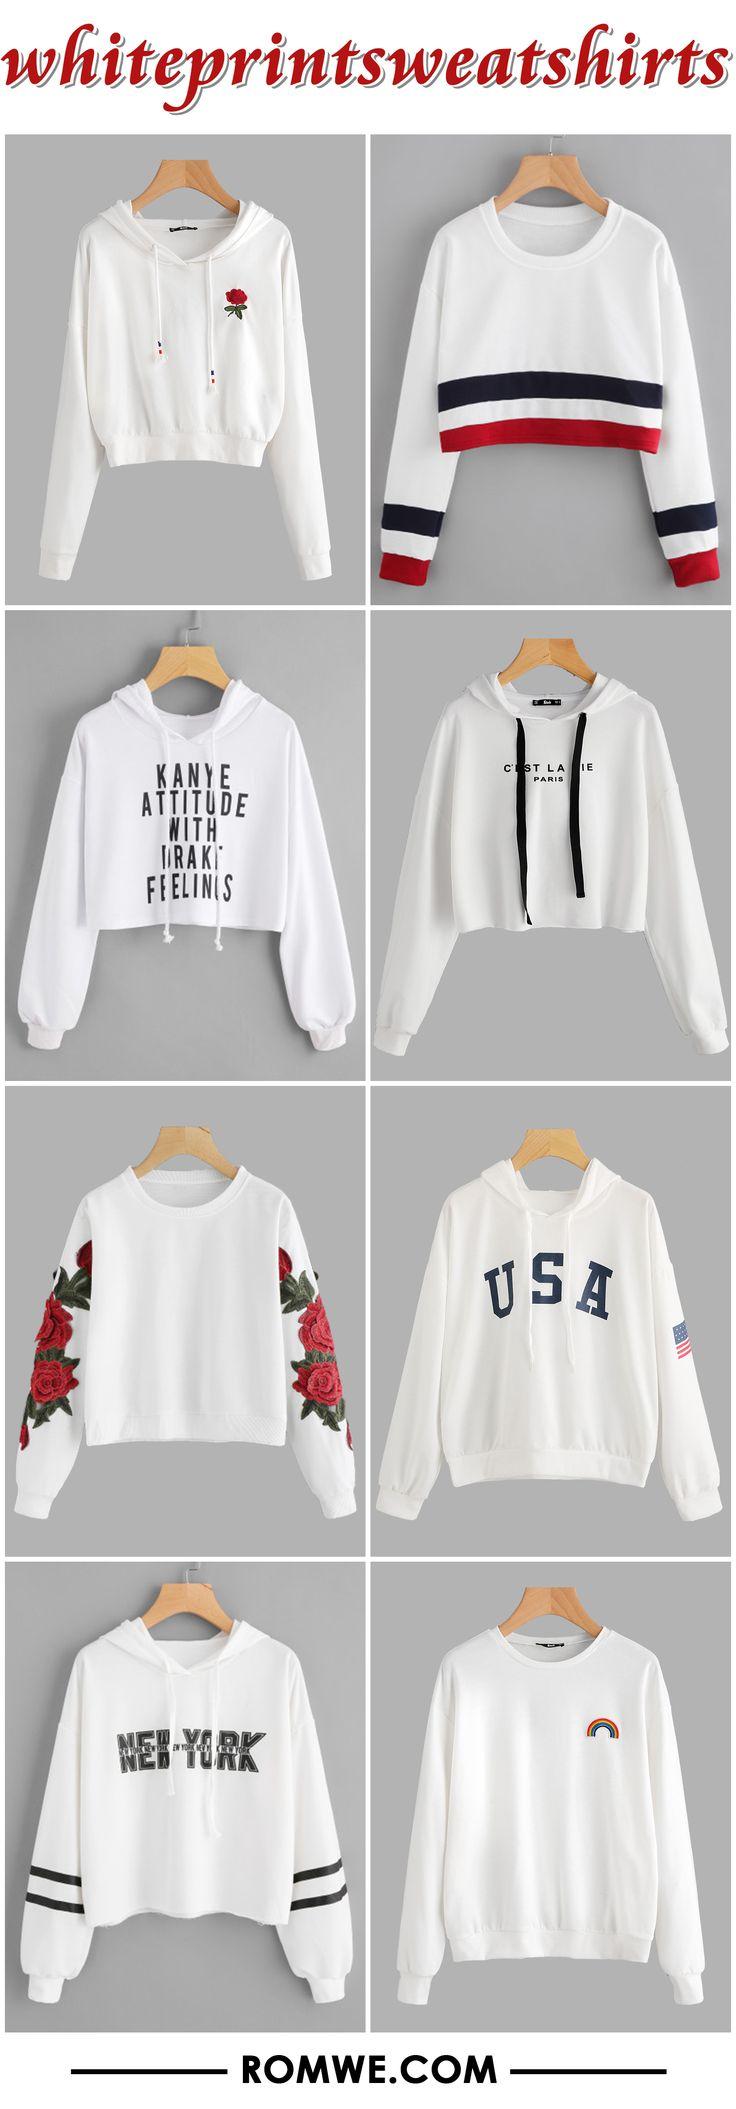 white print sweatshirts 2017 - romwe.com